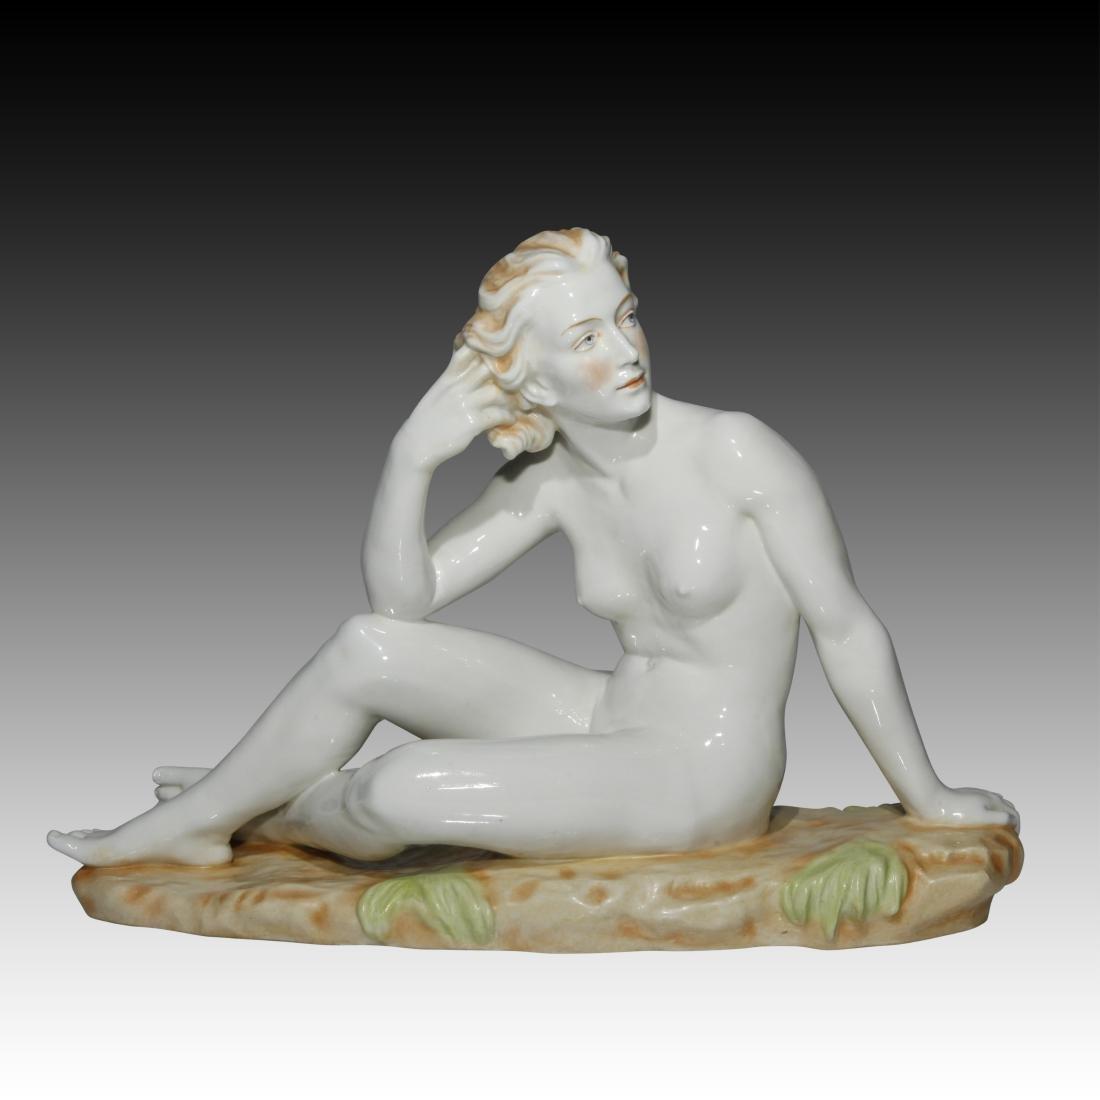 Nude Woman Sitting in a Field Figurine